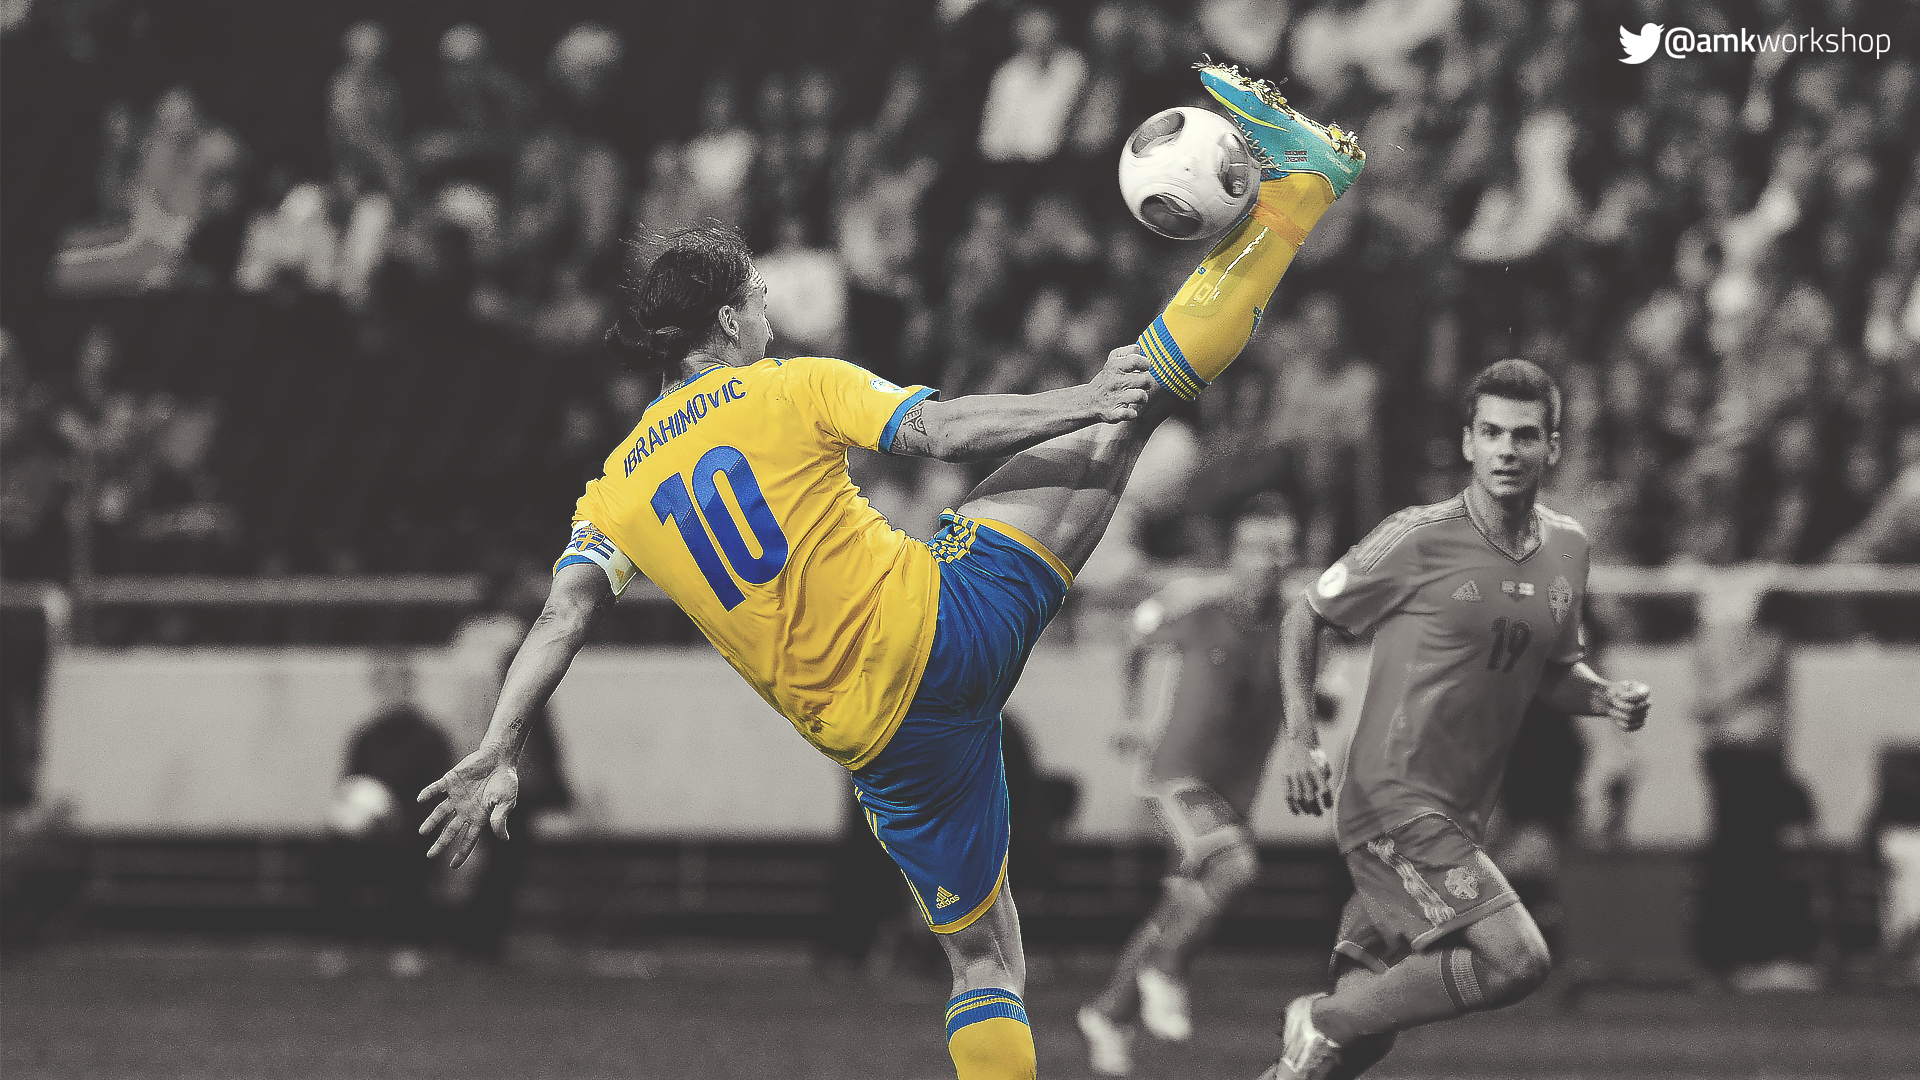 Zlatan Ibrahimovic Wallpaper 2014 Zlatan Ibrahimovic by ...